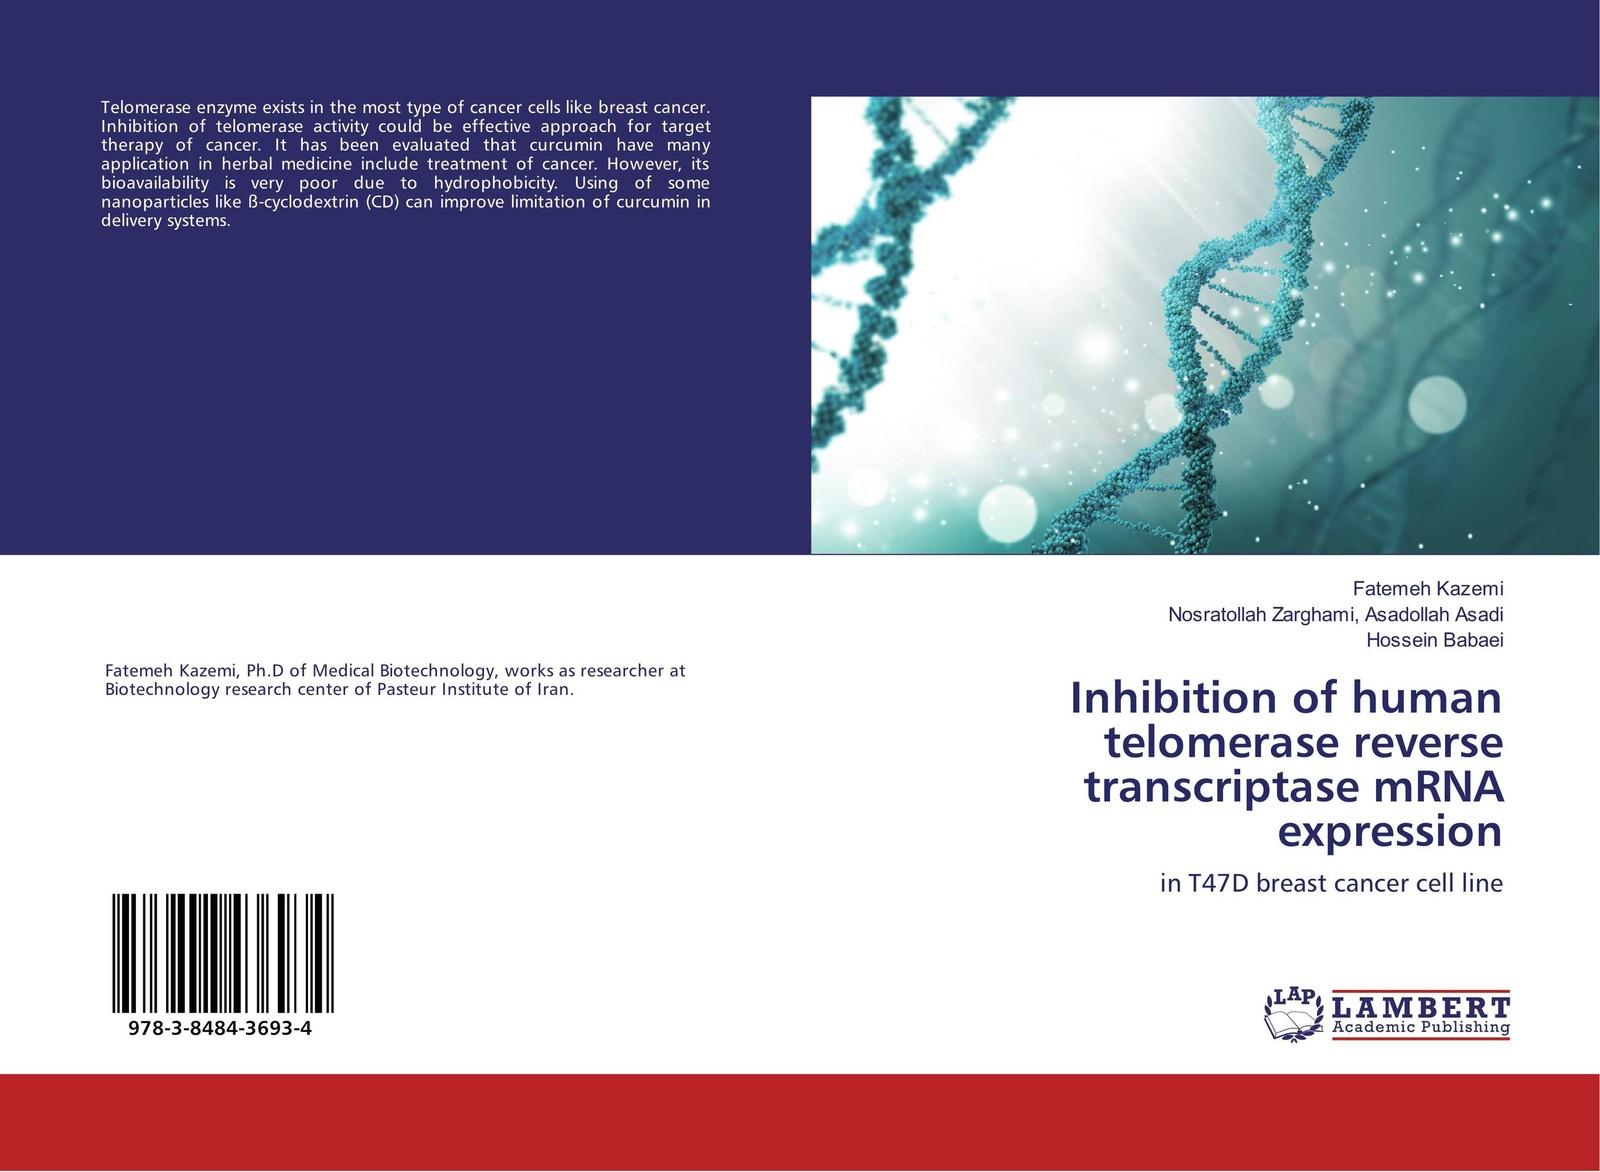 Fatemeh Kazemi,Nosratollah Zarghami, Asadollah Asadi and Hossein Babaei Inhibition of human telomerase reverse transcriptase mRNA expression curcumin 98